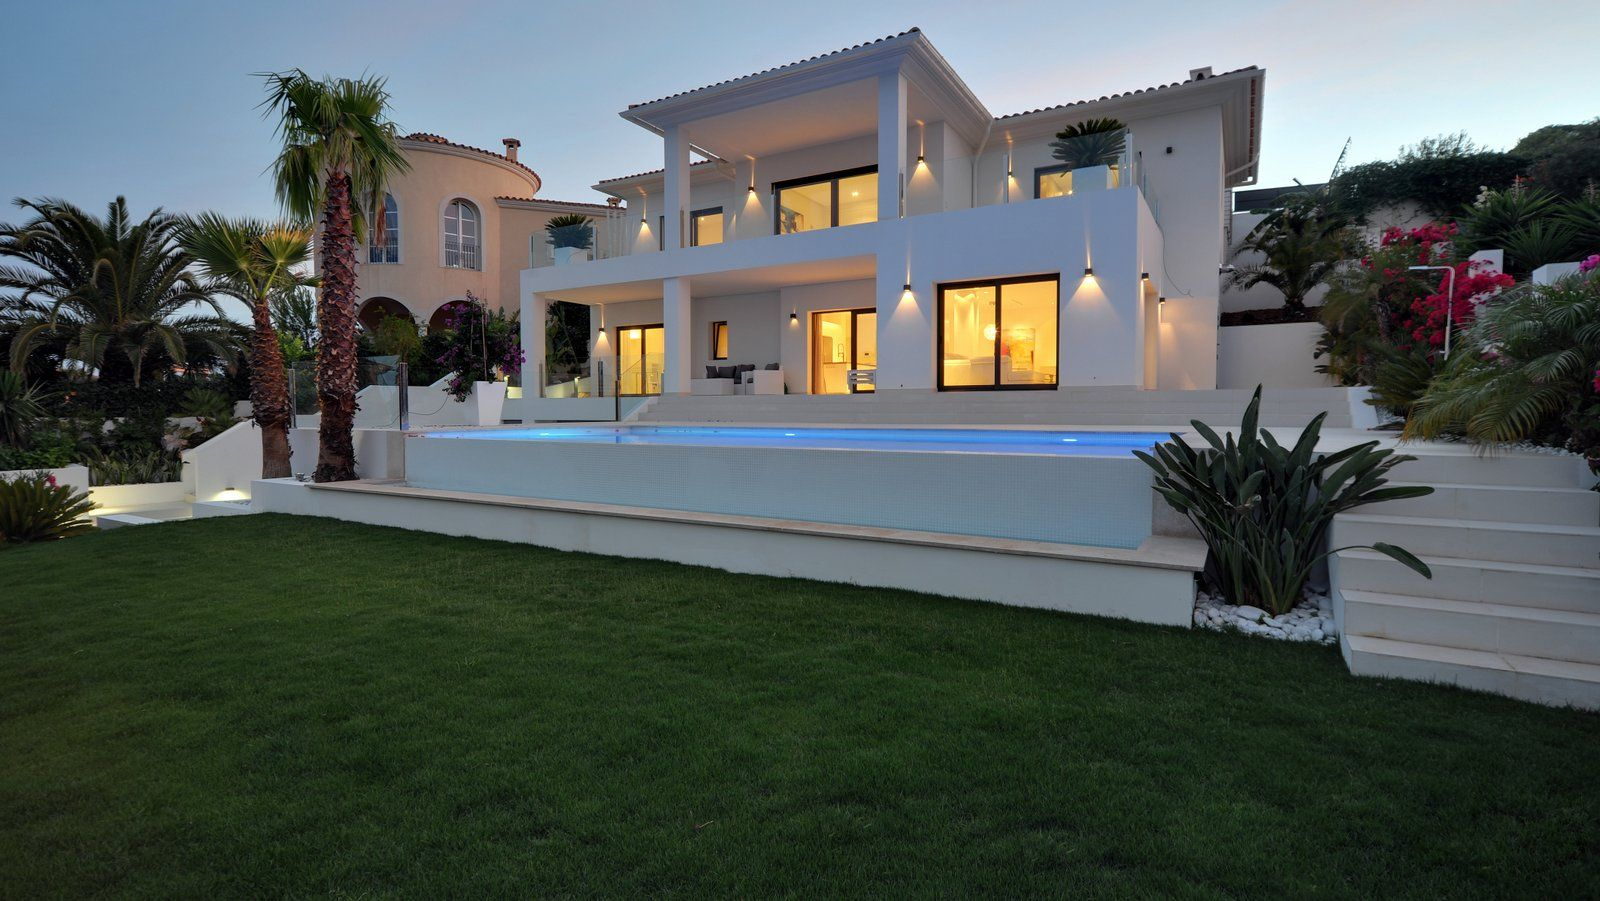 Immobilie Auf Mallorca Kaufen Luxusvilla In Nova Santa Ponsa Http Www Casanova Immobilien Mallorca Com De Suchergebnis 241614 1 Casas